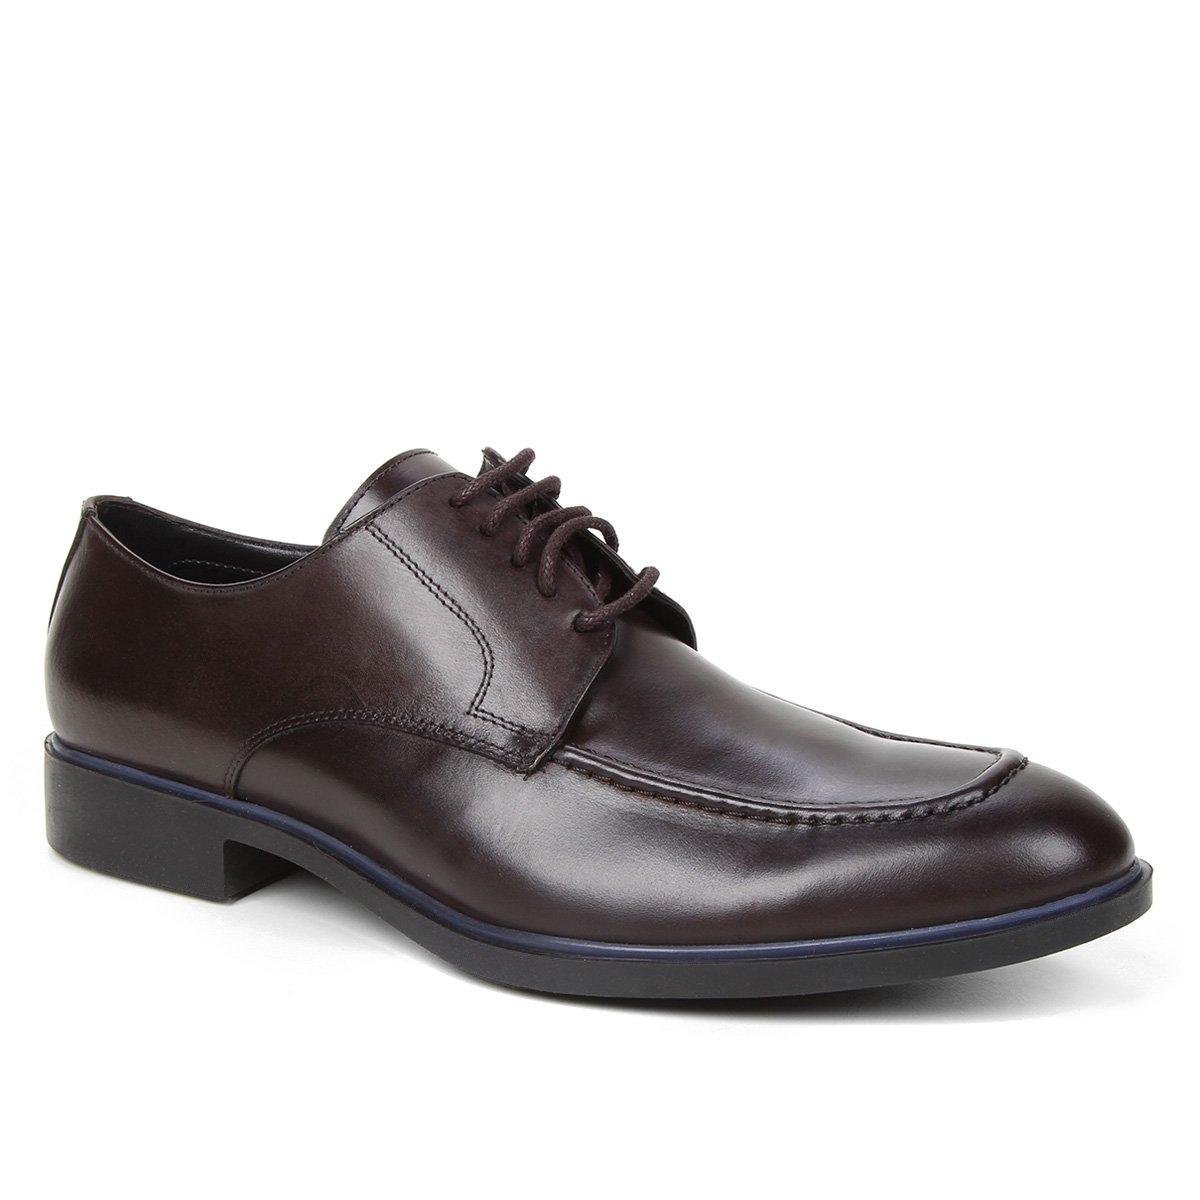 Sapato Social Couro Shoestock Clássico Cadarço Masculino